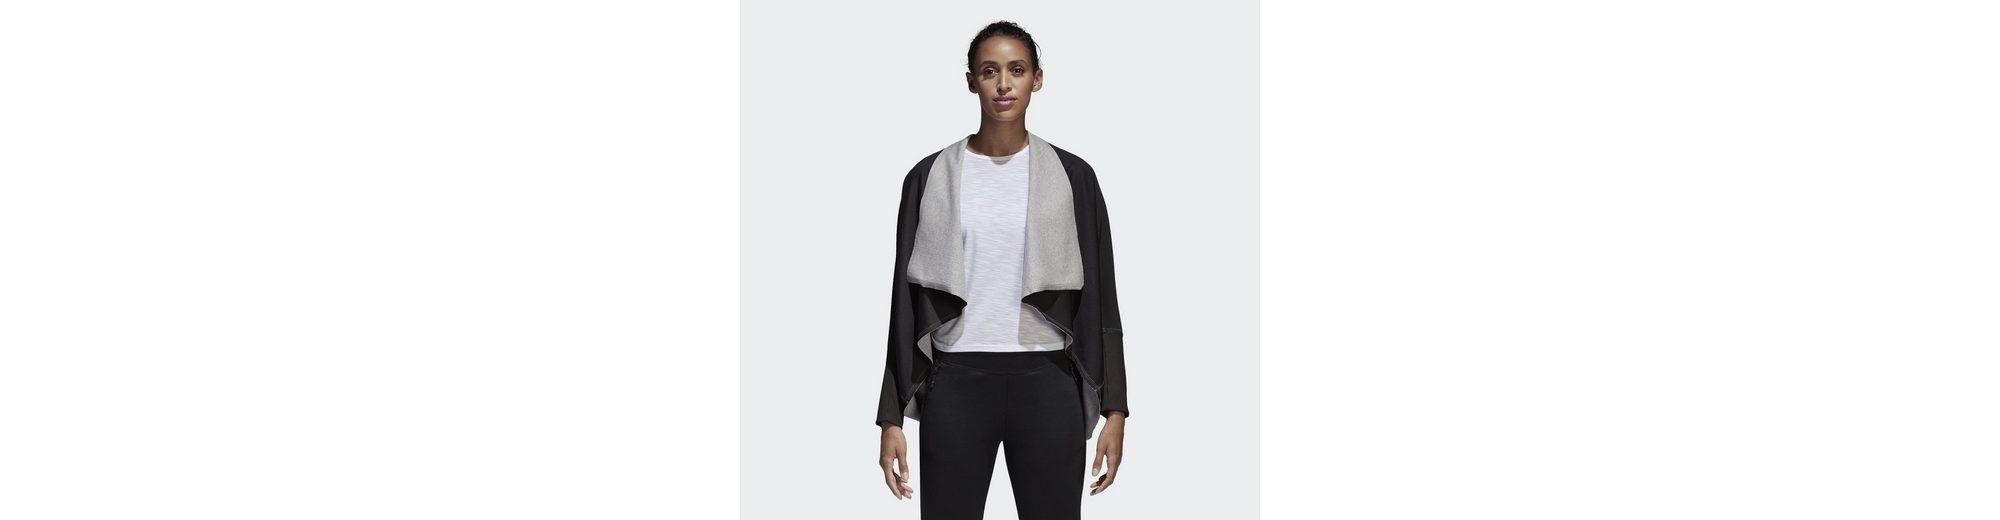 Exklusiv adidas Performance Longpullover ID Twist n Turn Cardigan Neue Art Und Weise Stil 60FGsqTnW